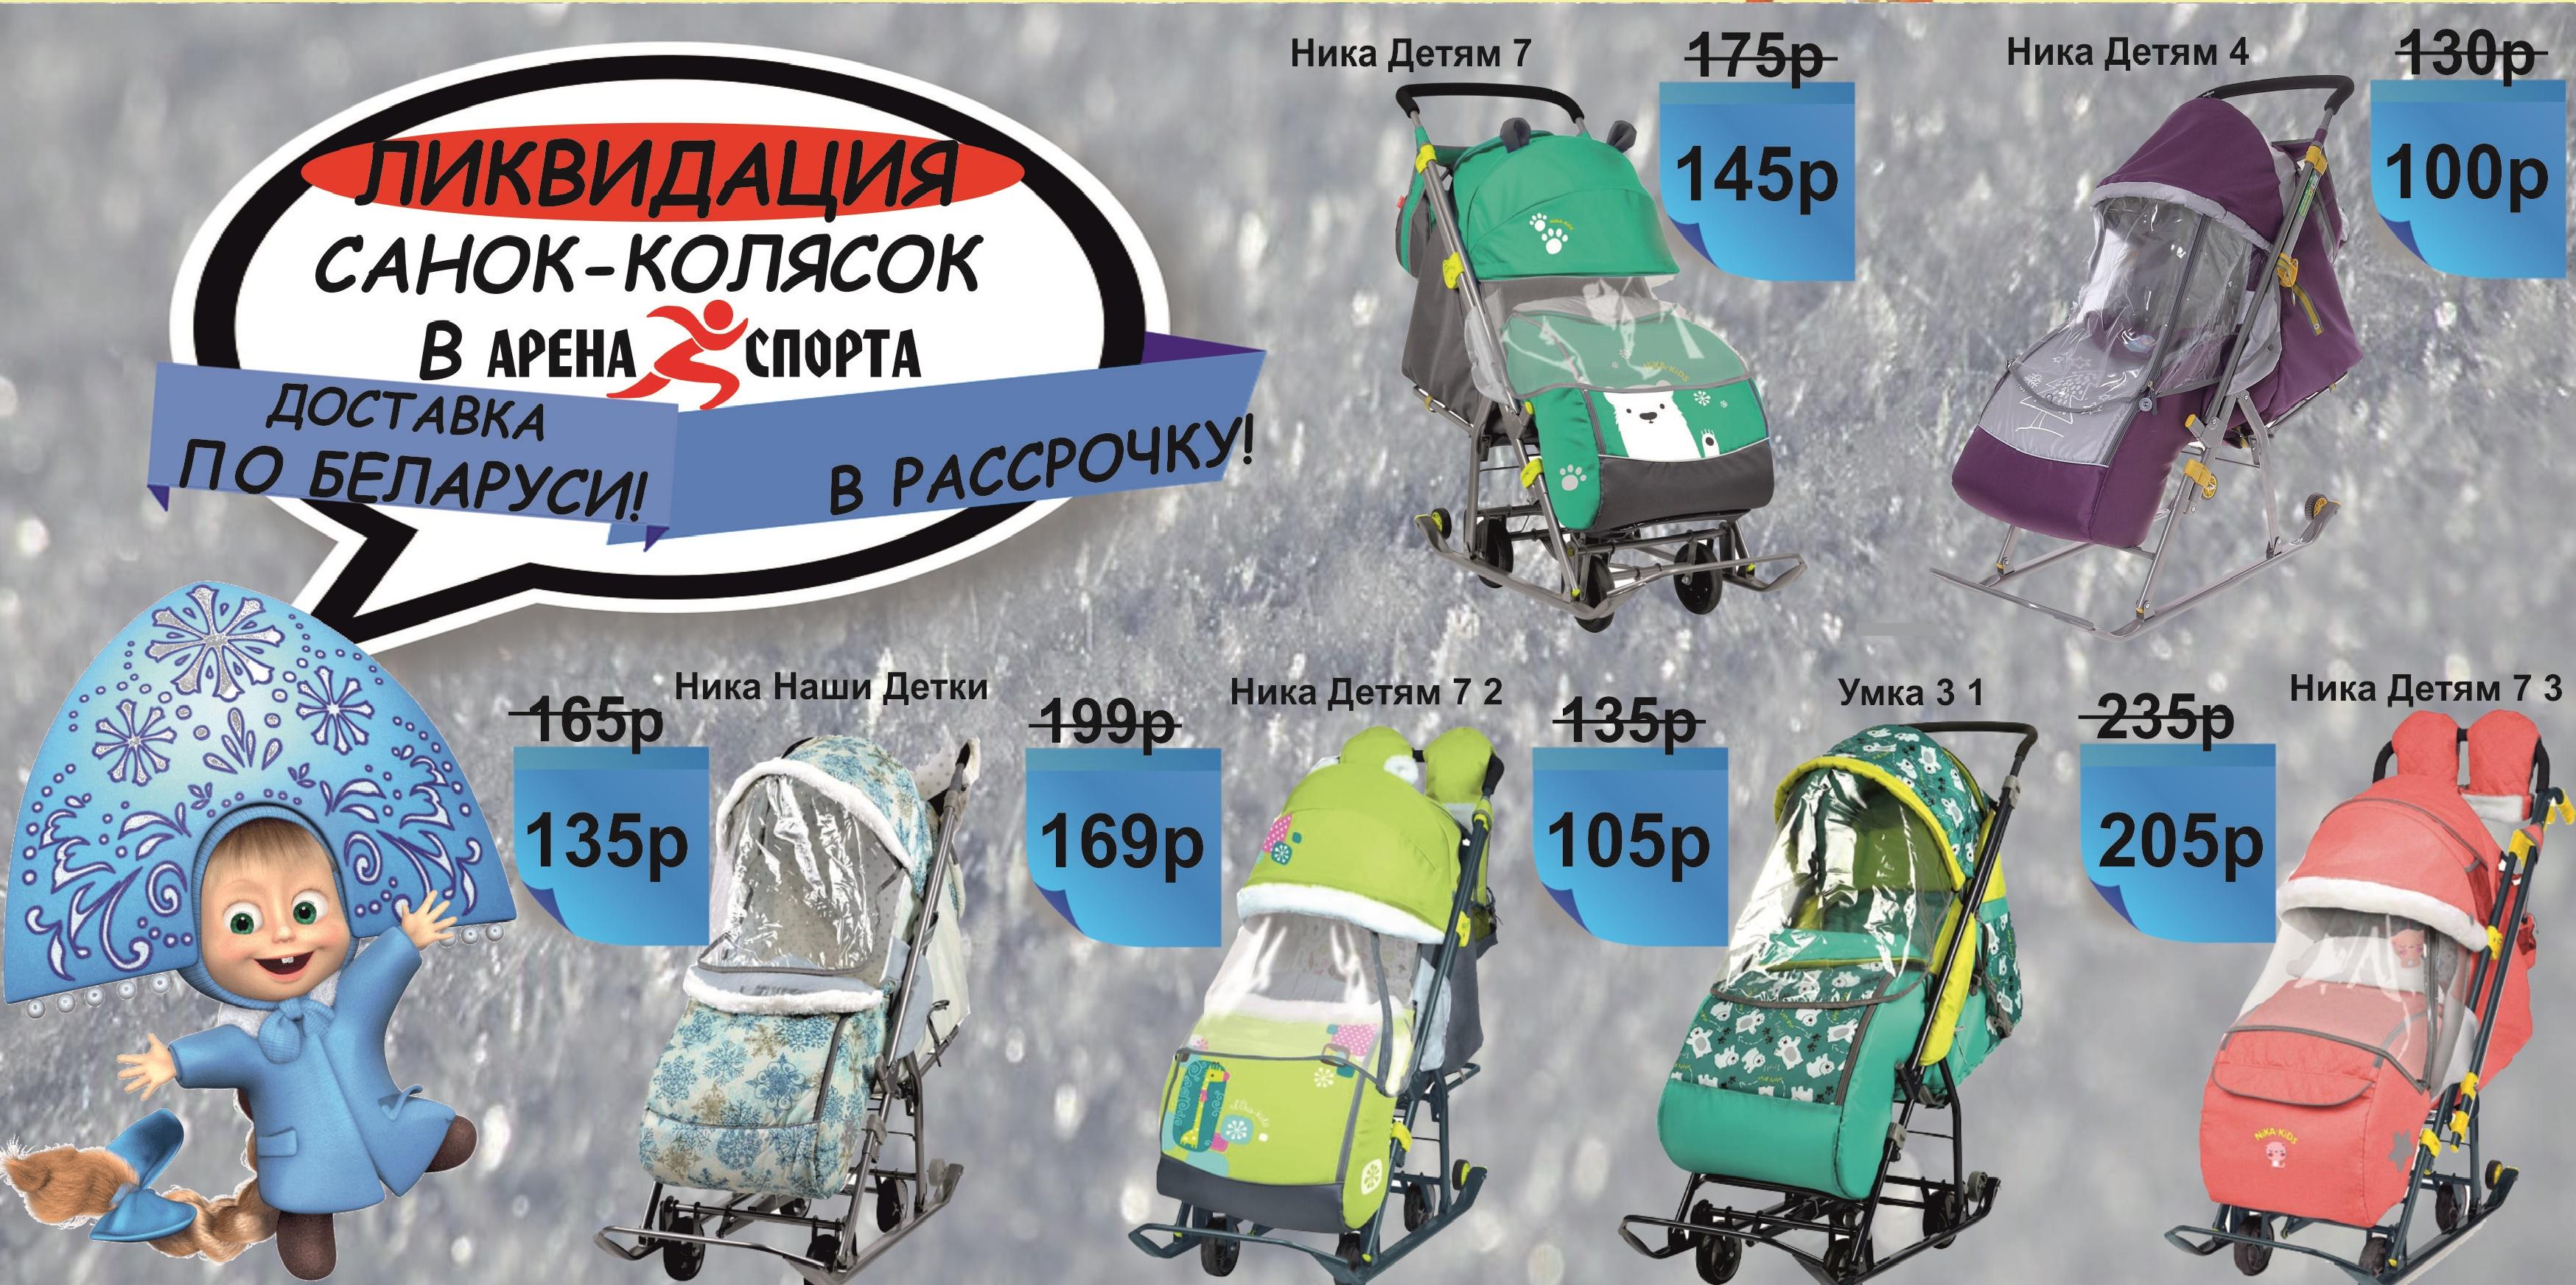 http://arena-sporta.by/catalog/sanki/klassicheskie-sanki